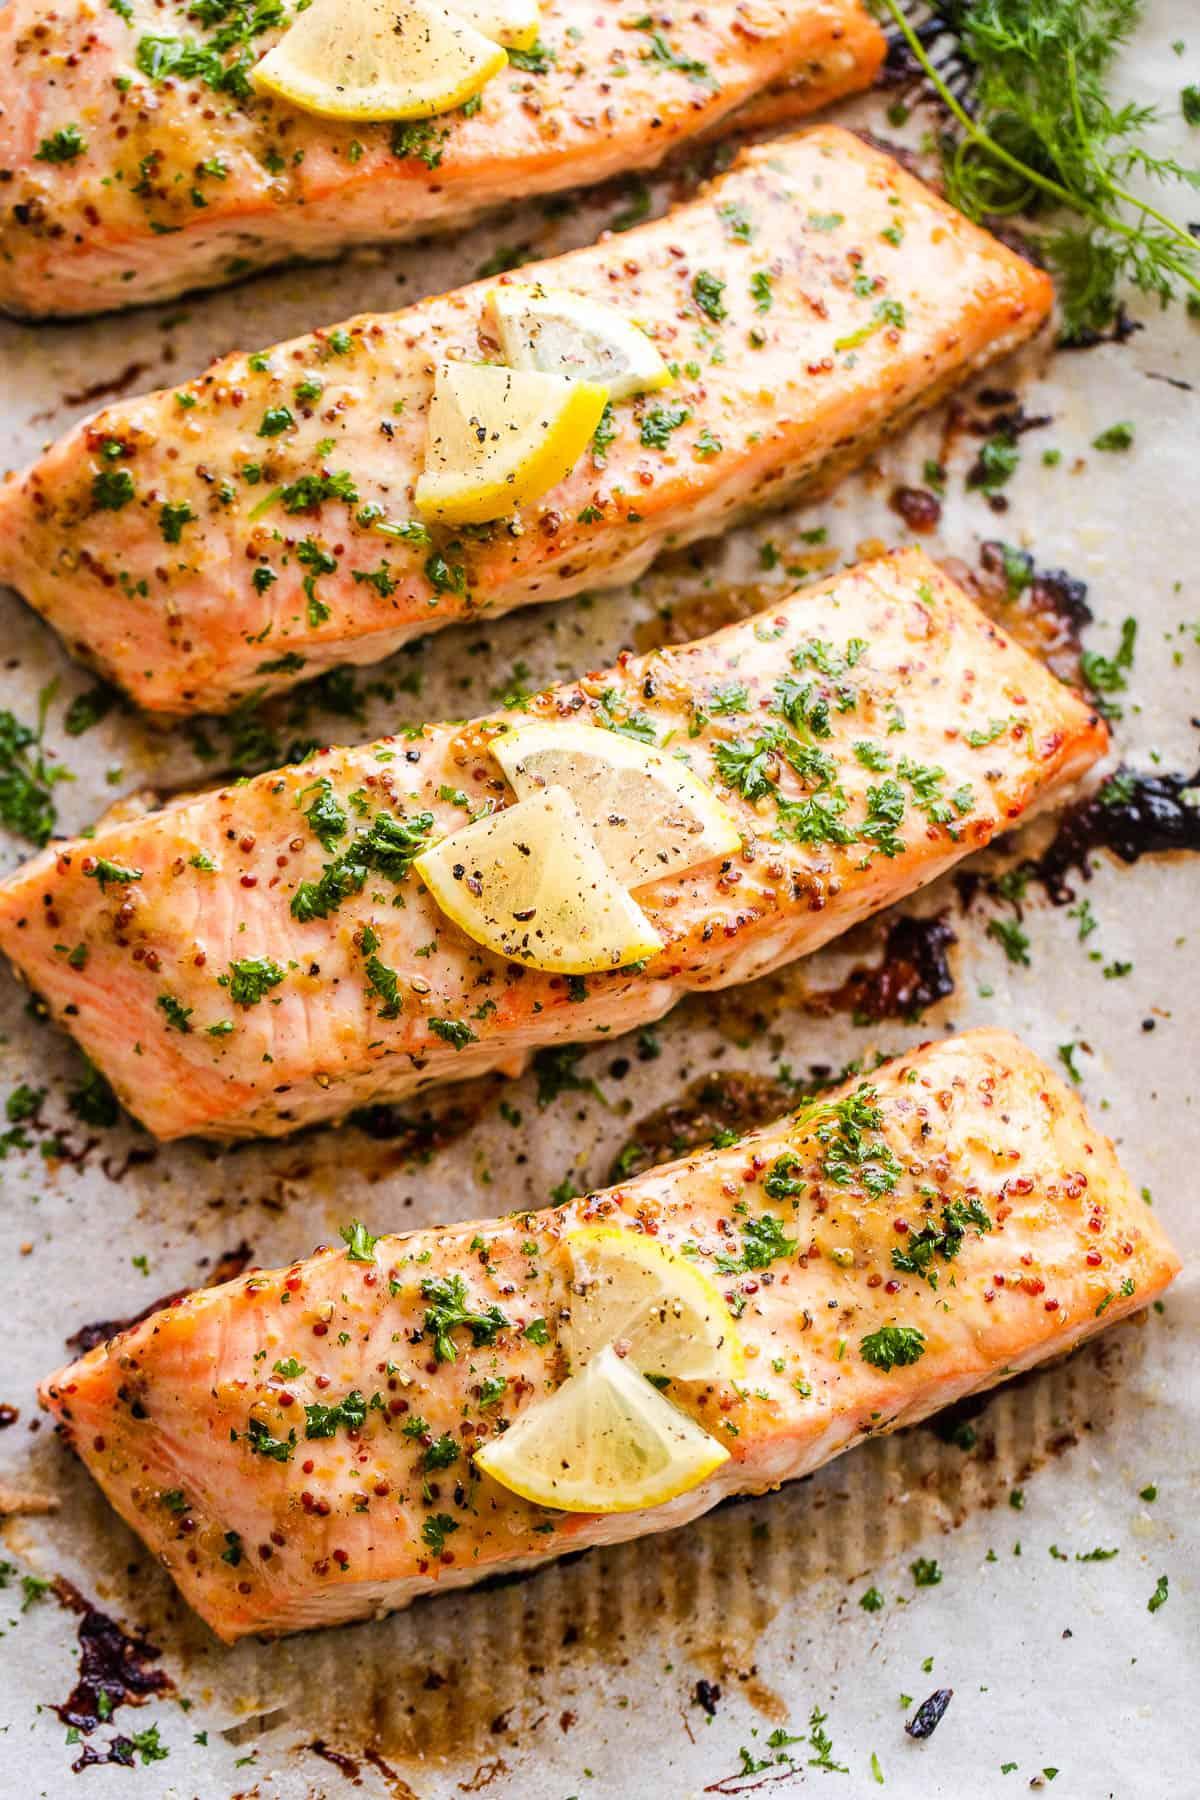 four maple mustard salmon fillets arranged on a baking sheet